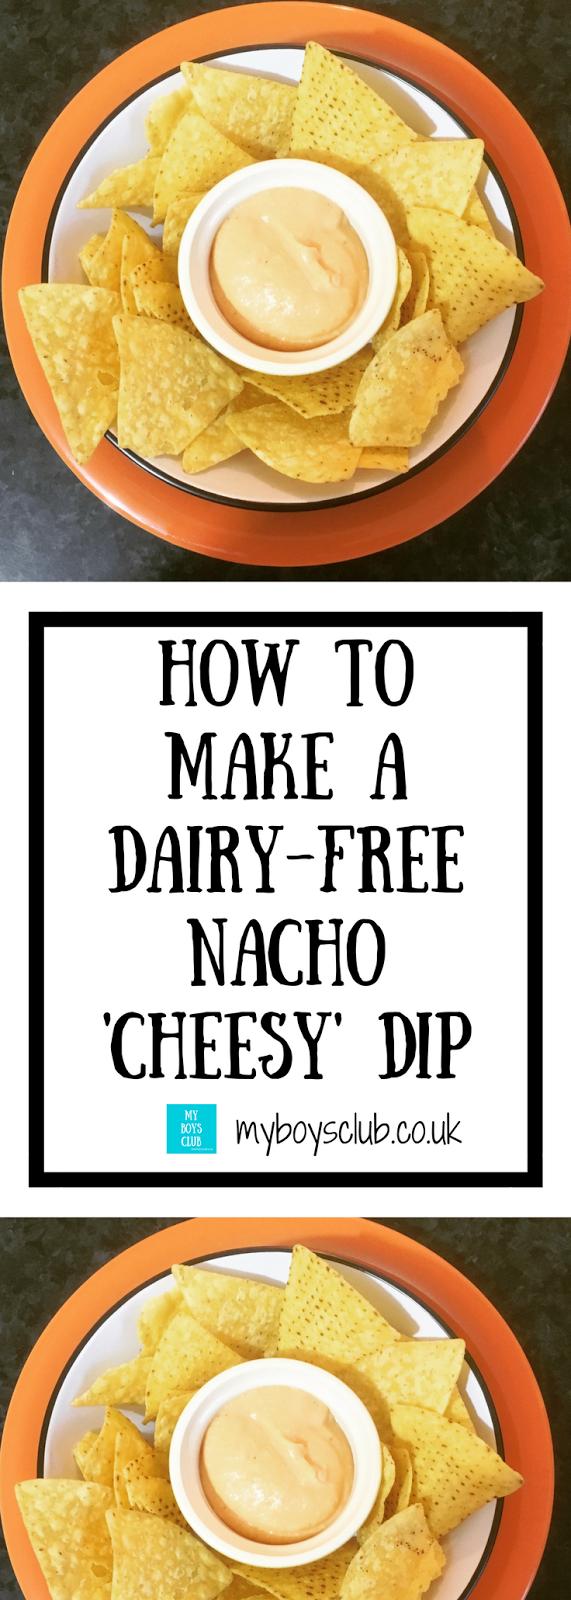 how to make simple nachos dip